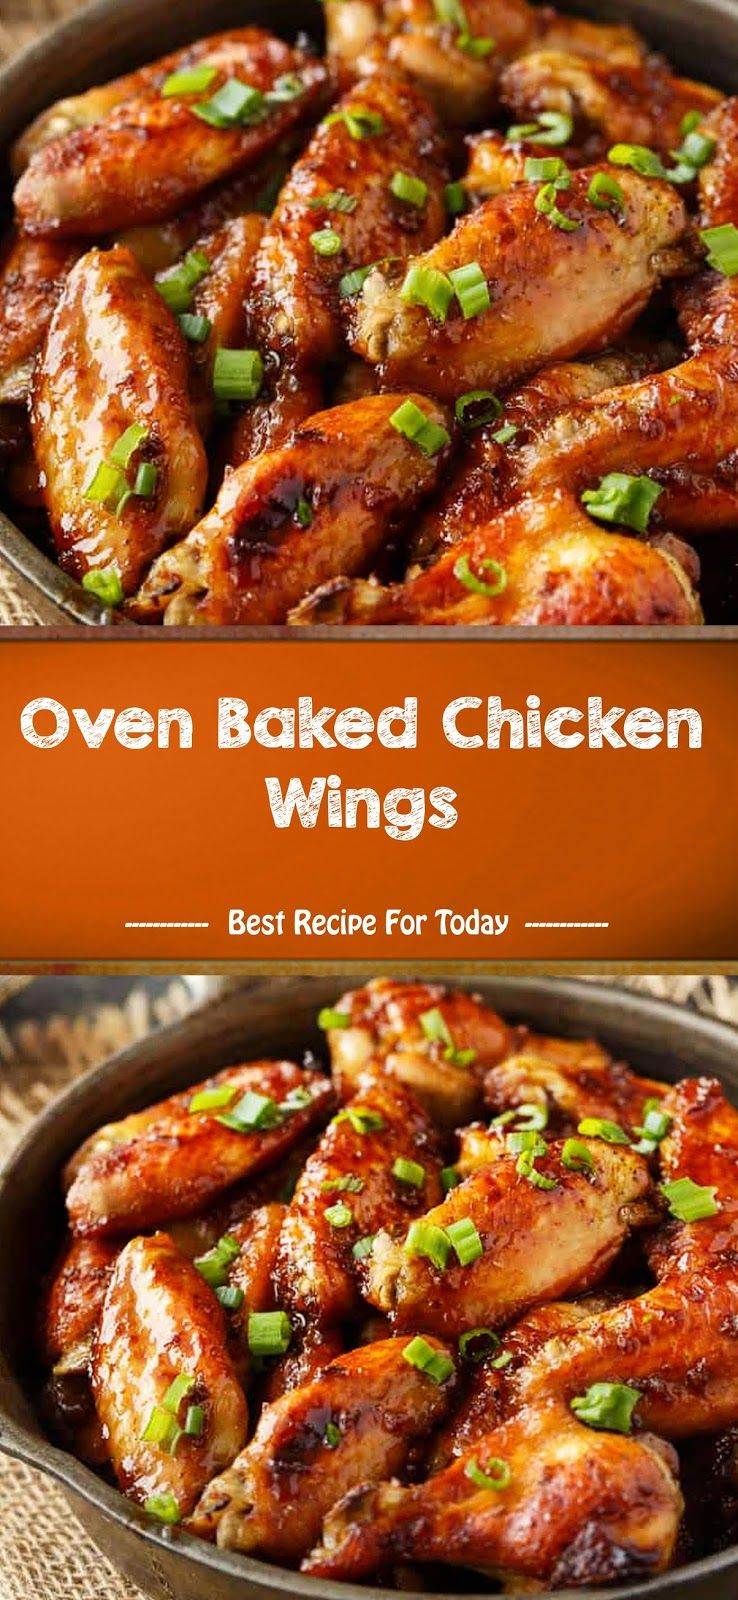 Caramelized Baked Chicken Legs&Wings Recipe | Panlasang